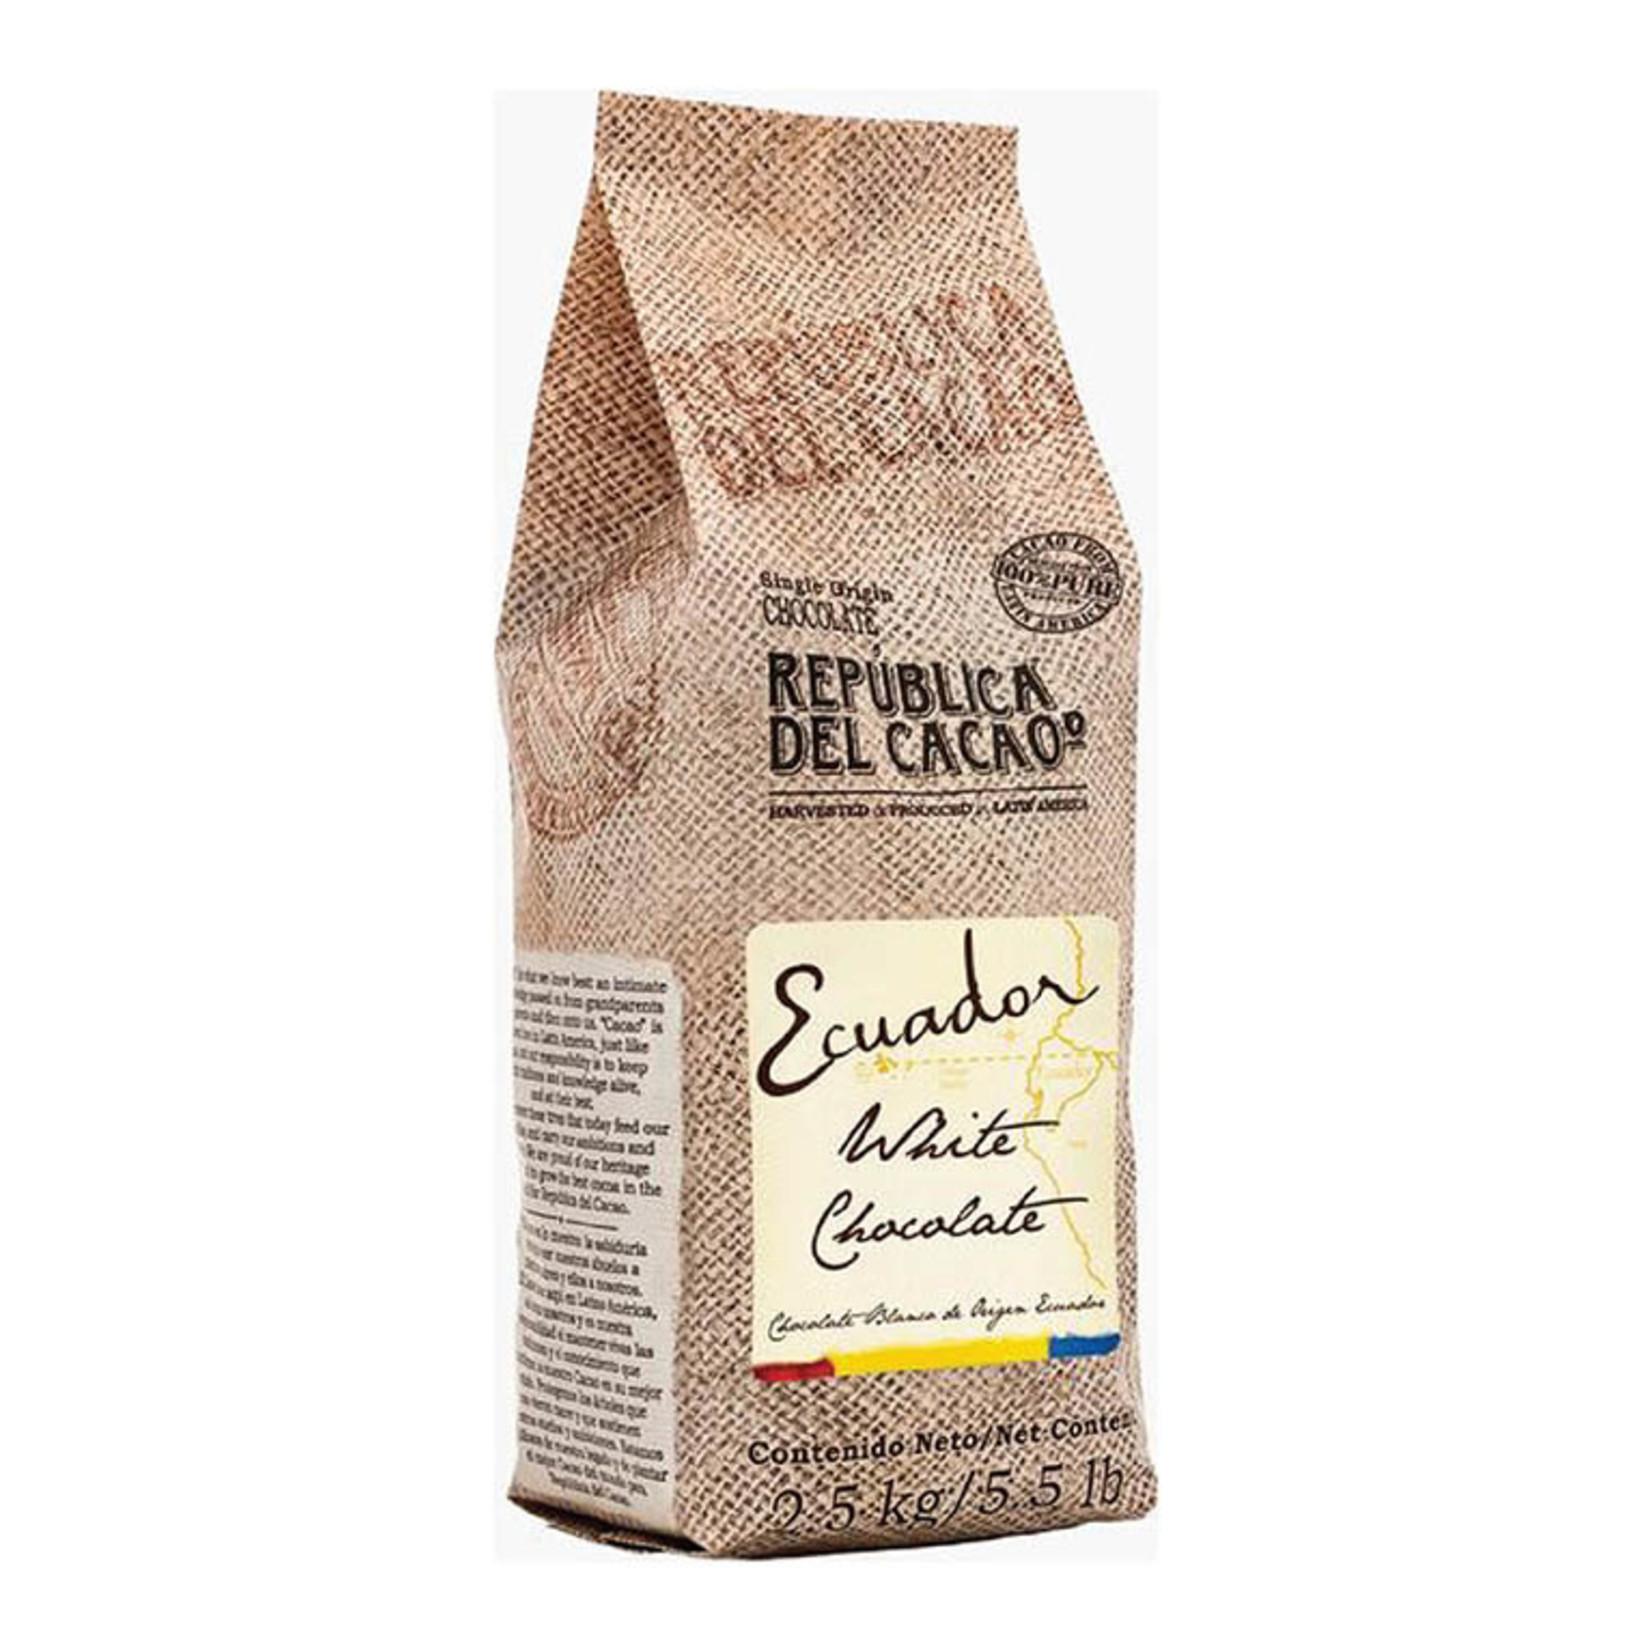 Republica del Cacao Republica del Cacao - Ecuador White Chocolate 31% - 5.5lb, 18843